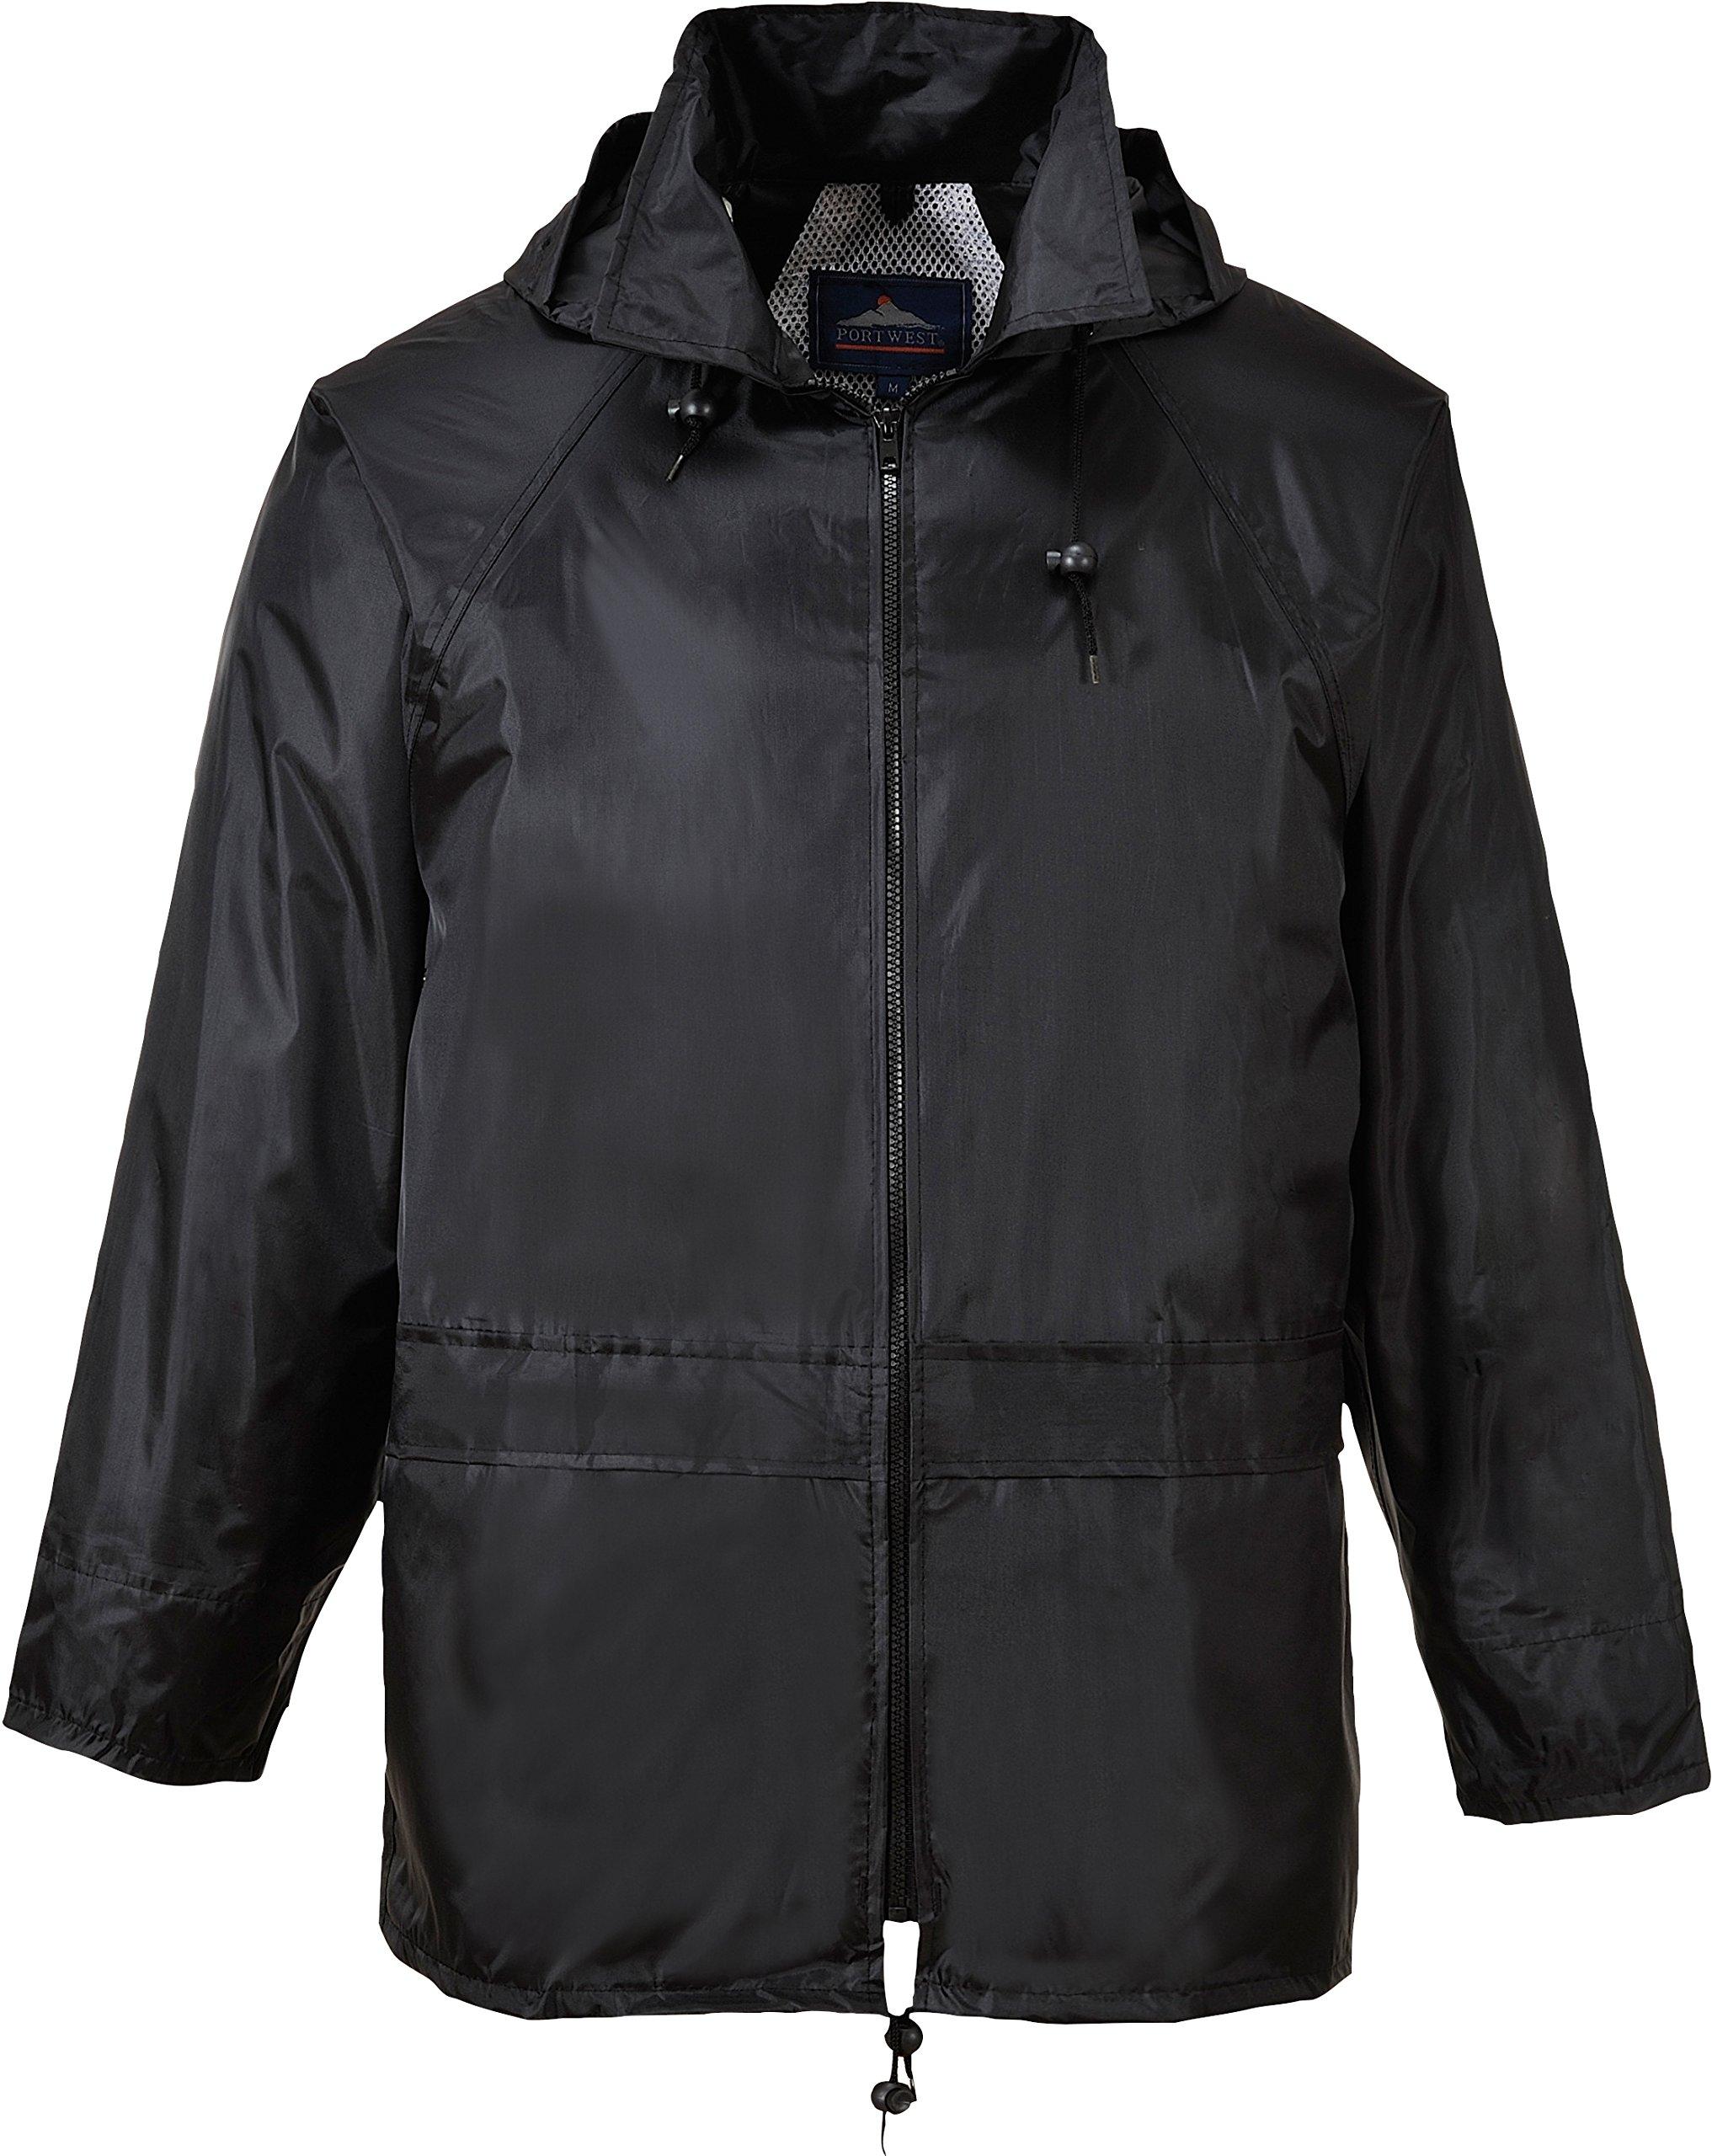 Portwest Classic Rain Jacket, Small to XXL, 3 colours - Black - XL